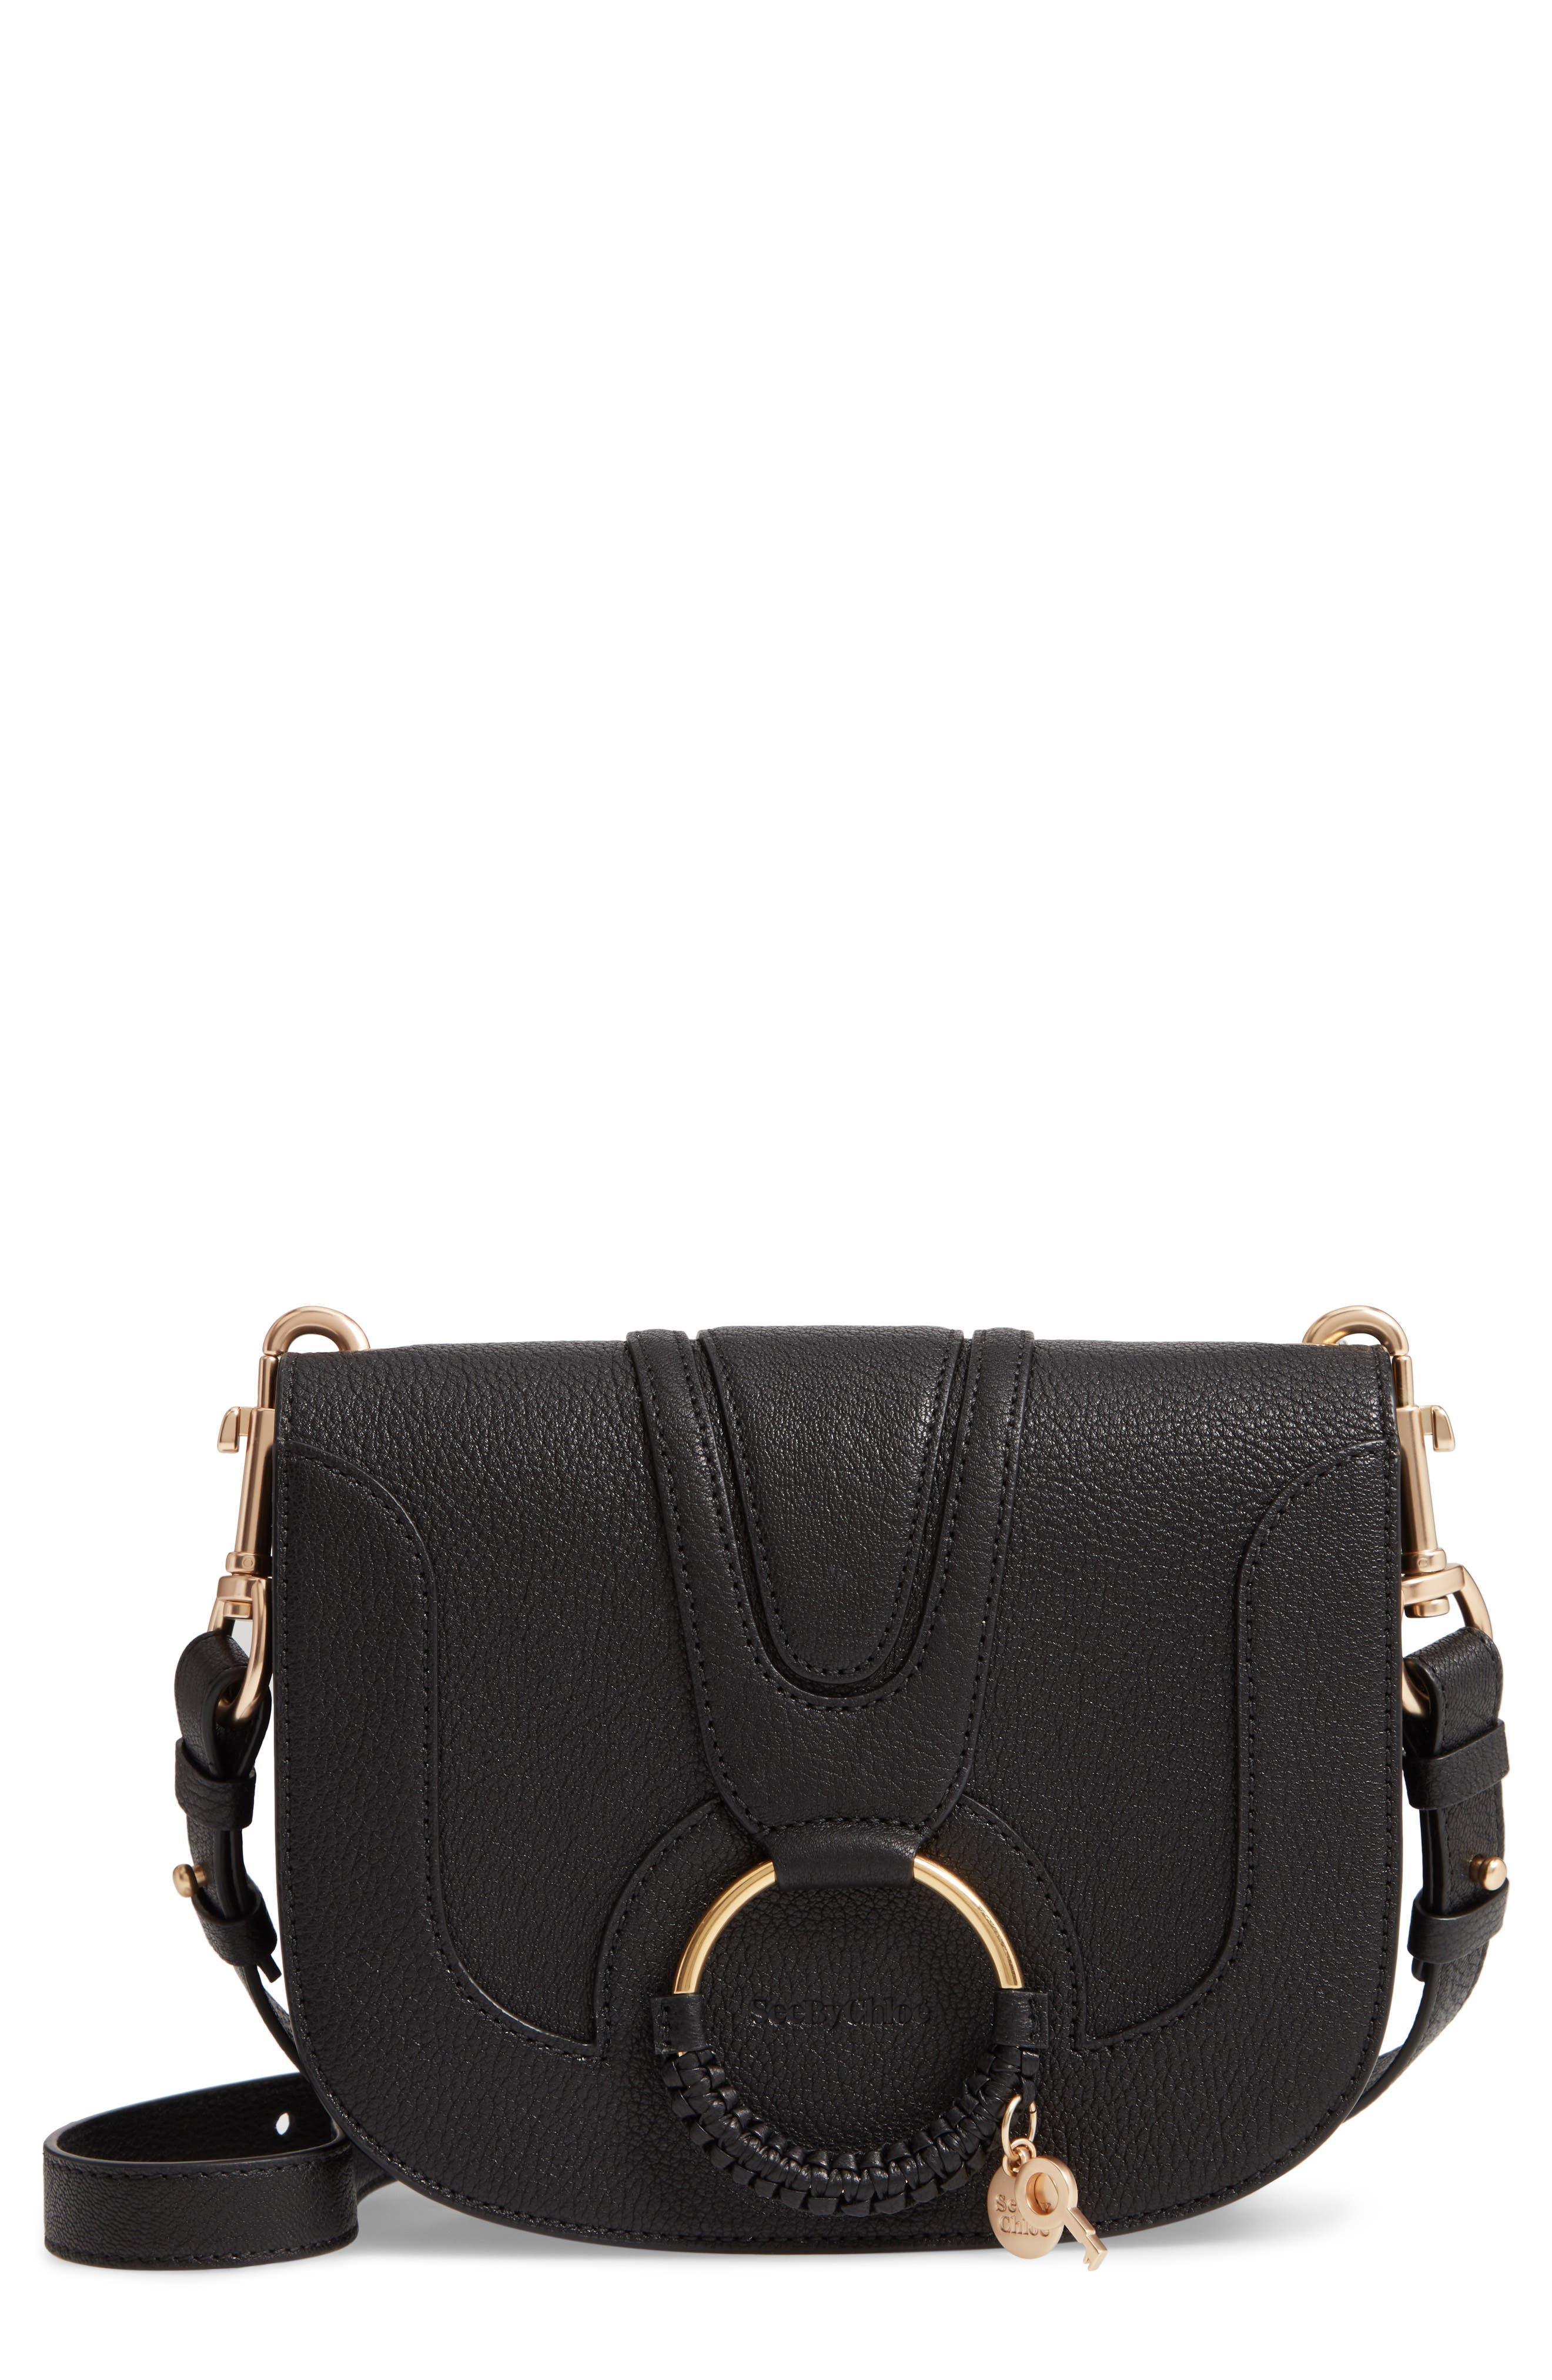 SEE BY CHLOÉ Hana Small Leather Crossbody Bag, Main, color, 001